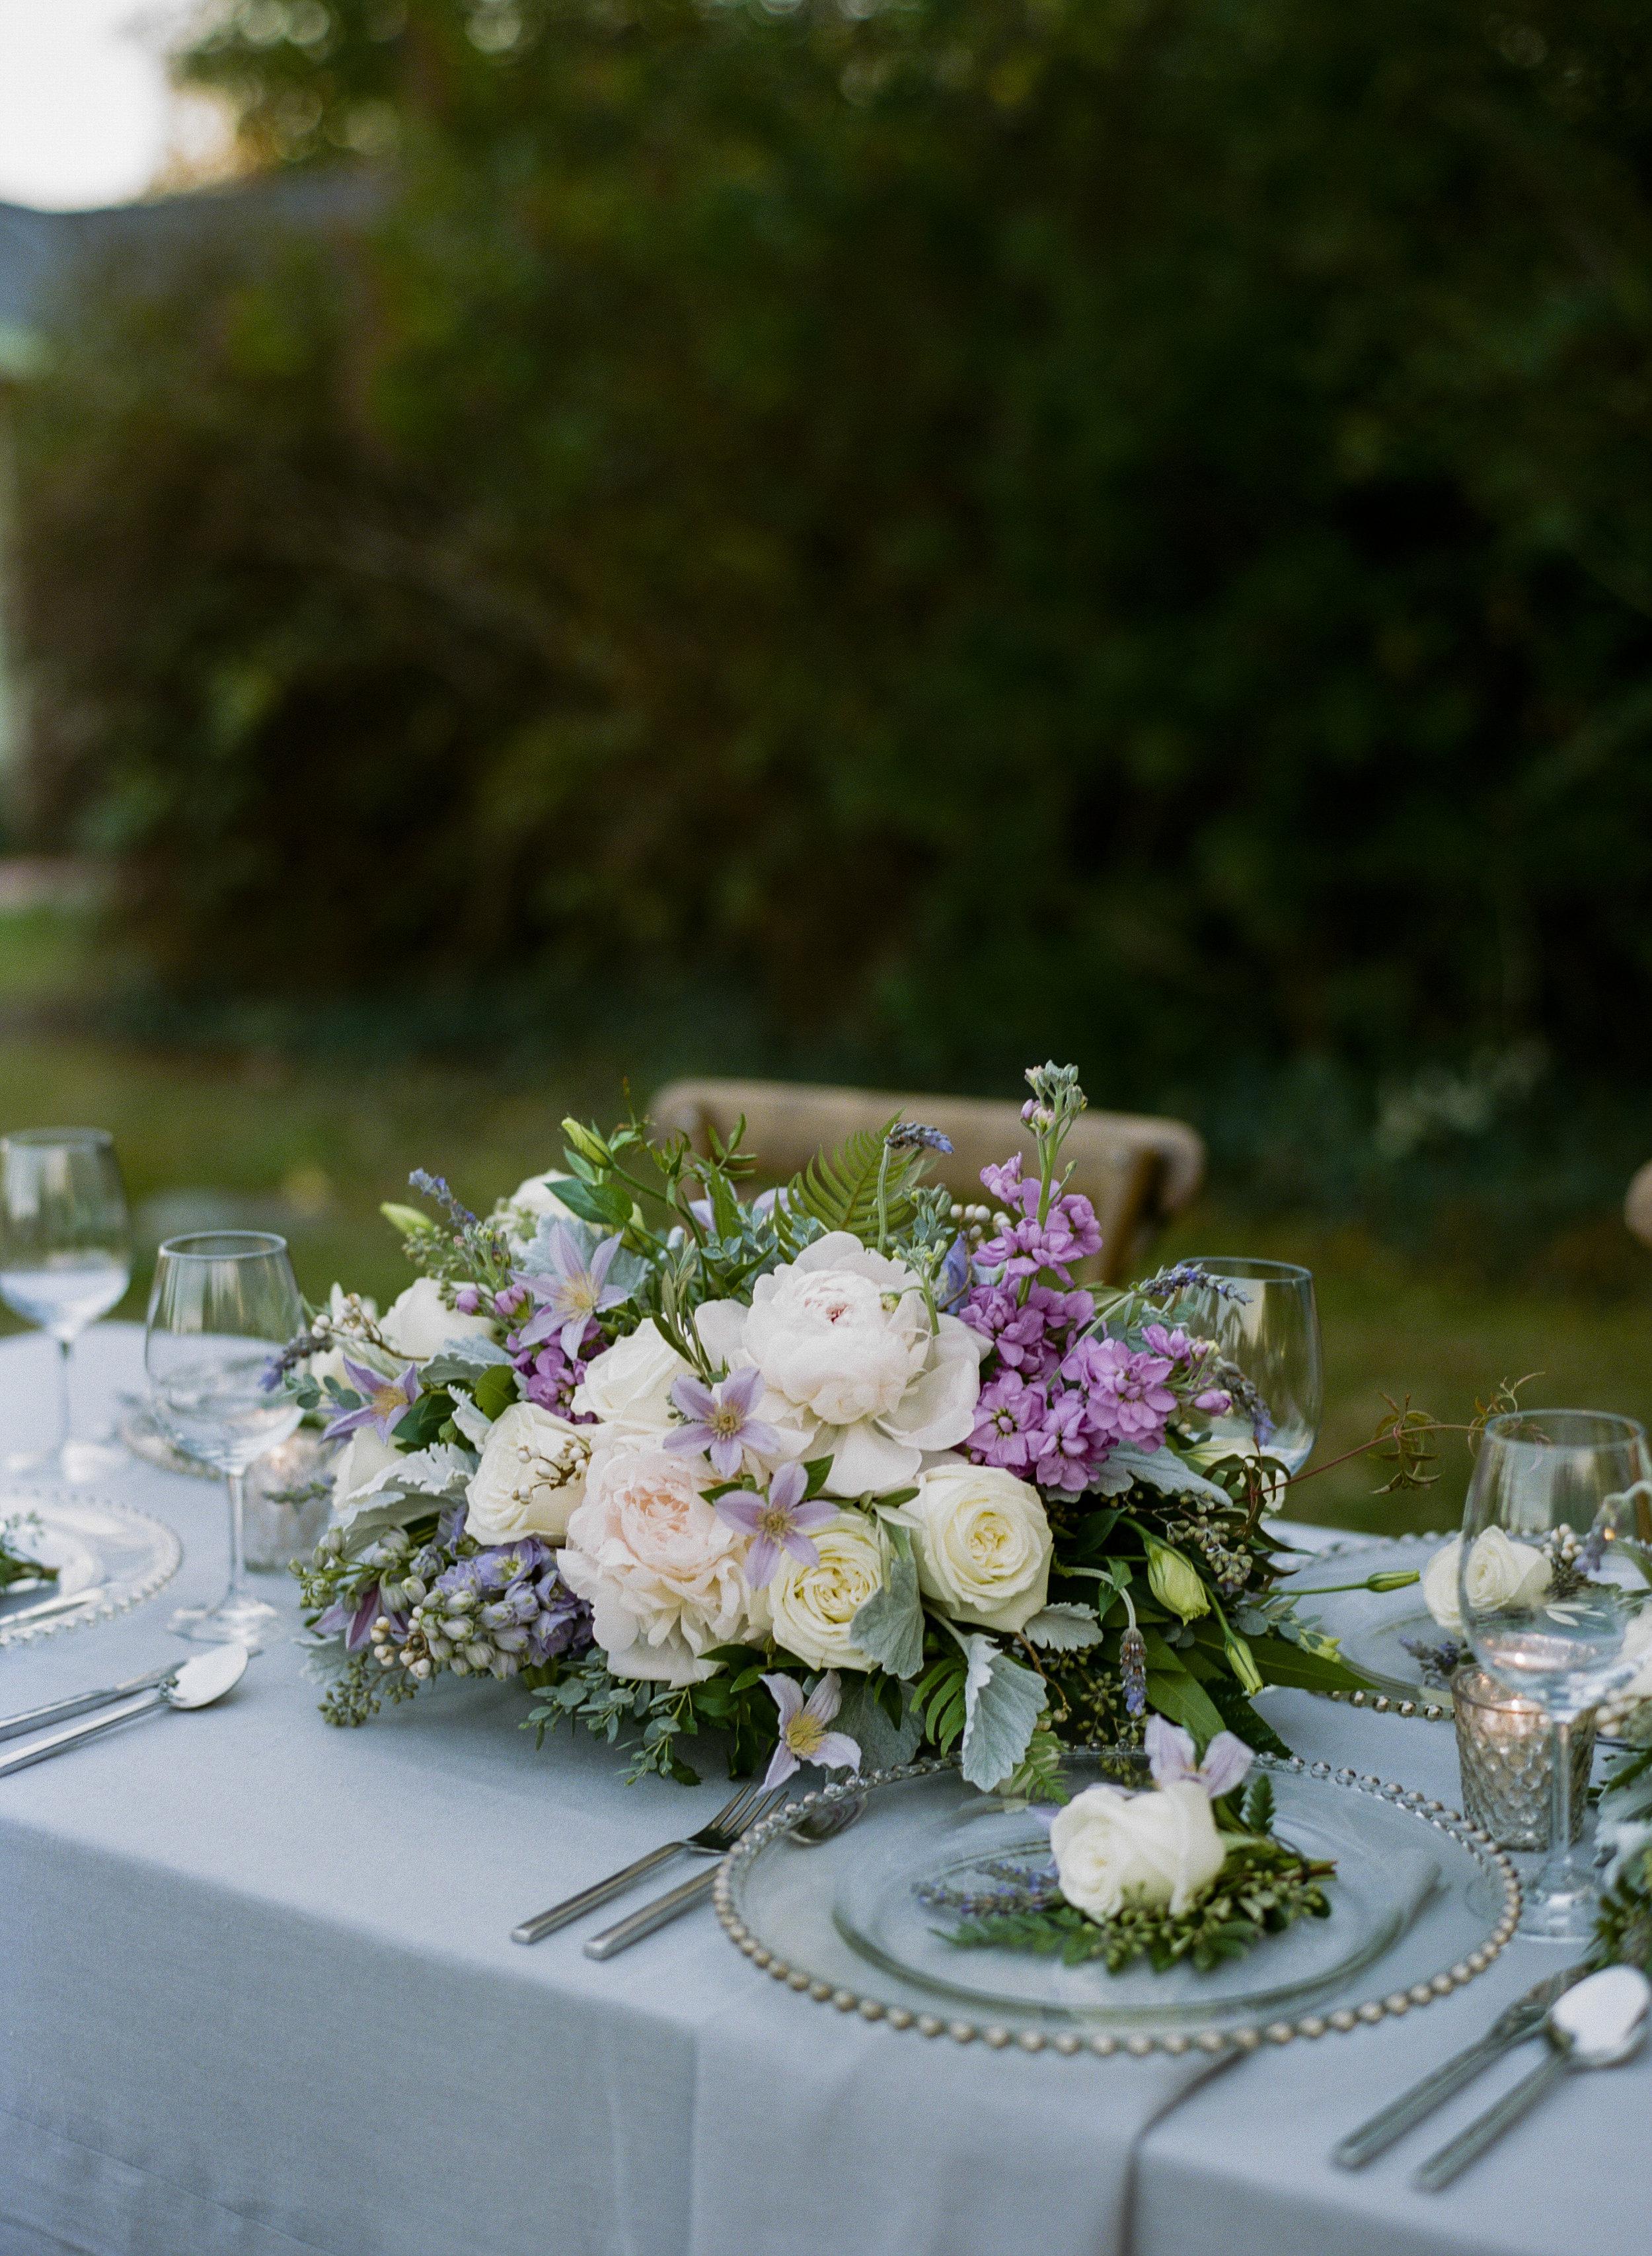 Violette-fleurs-roseville-sacramento-california-Flower-farm-inn-wedding-florist-spring-tablescape-purples-blushes-grays-upscale-design.jpg